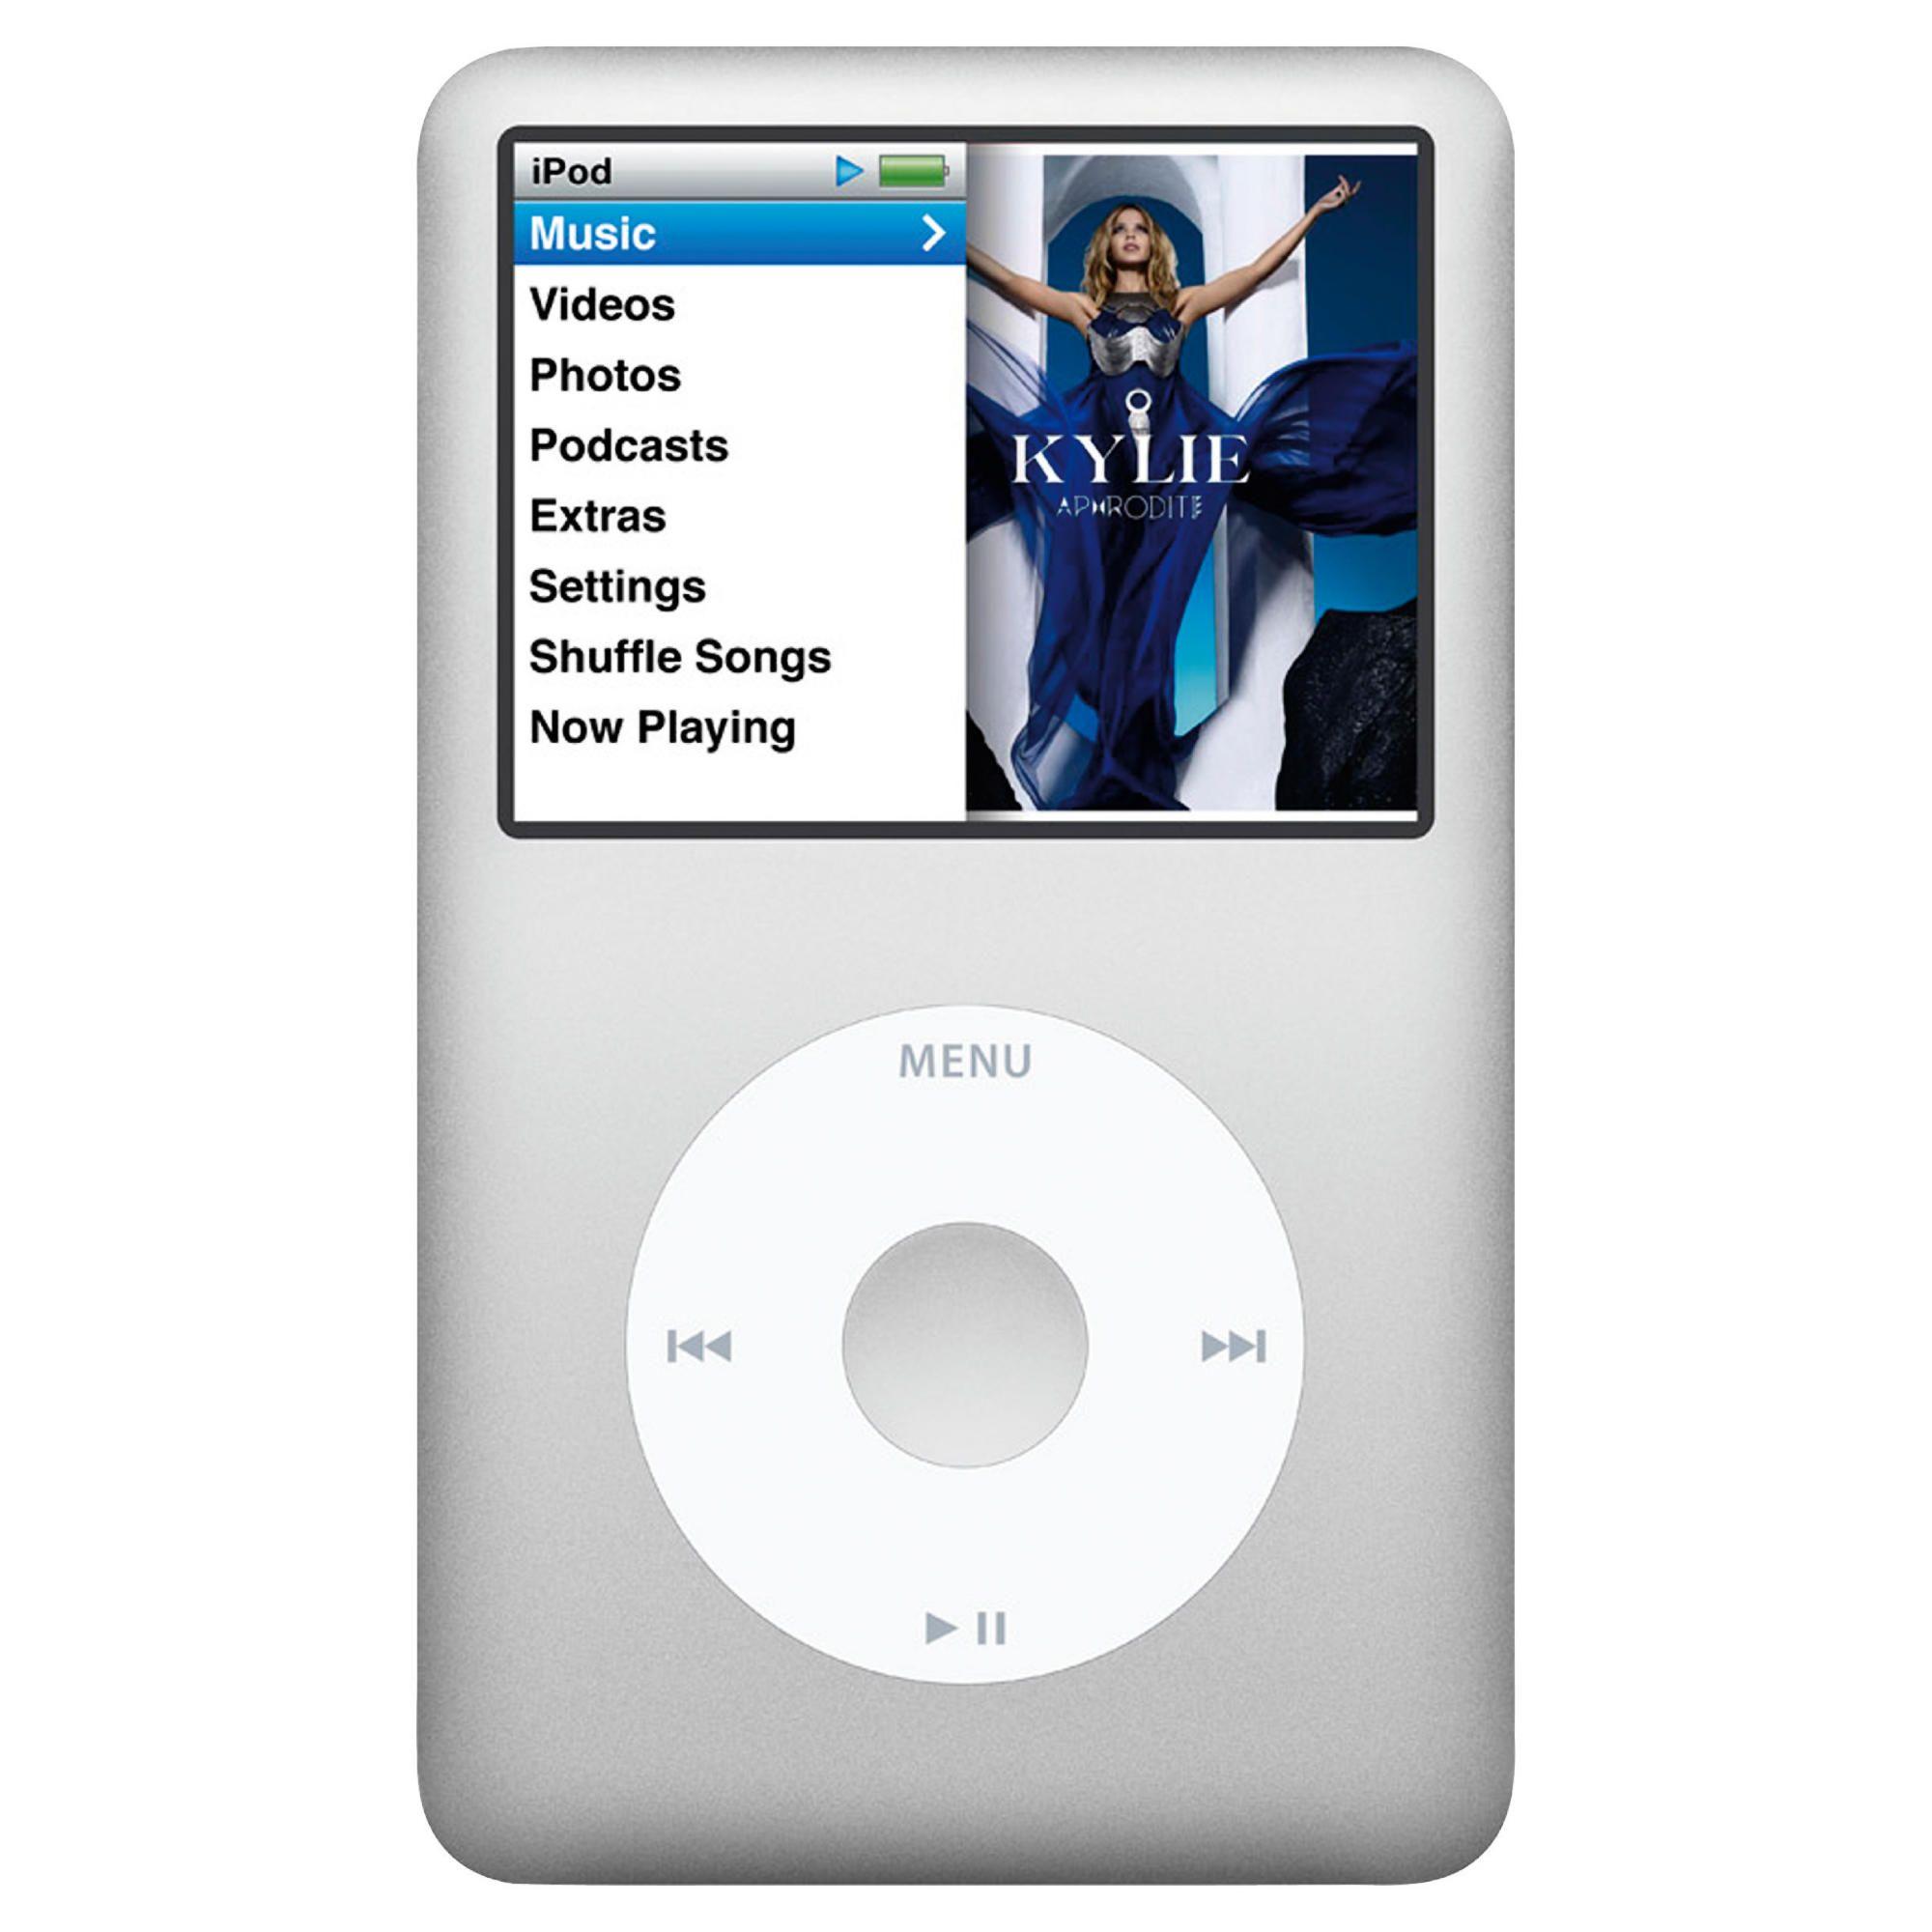 apple ipod classic 160gb silver the original ipod classic nowOriginal Ipod